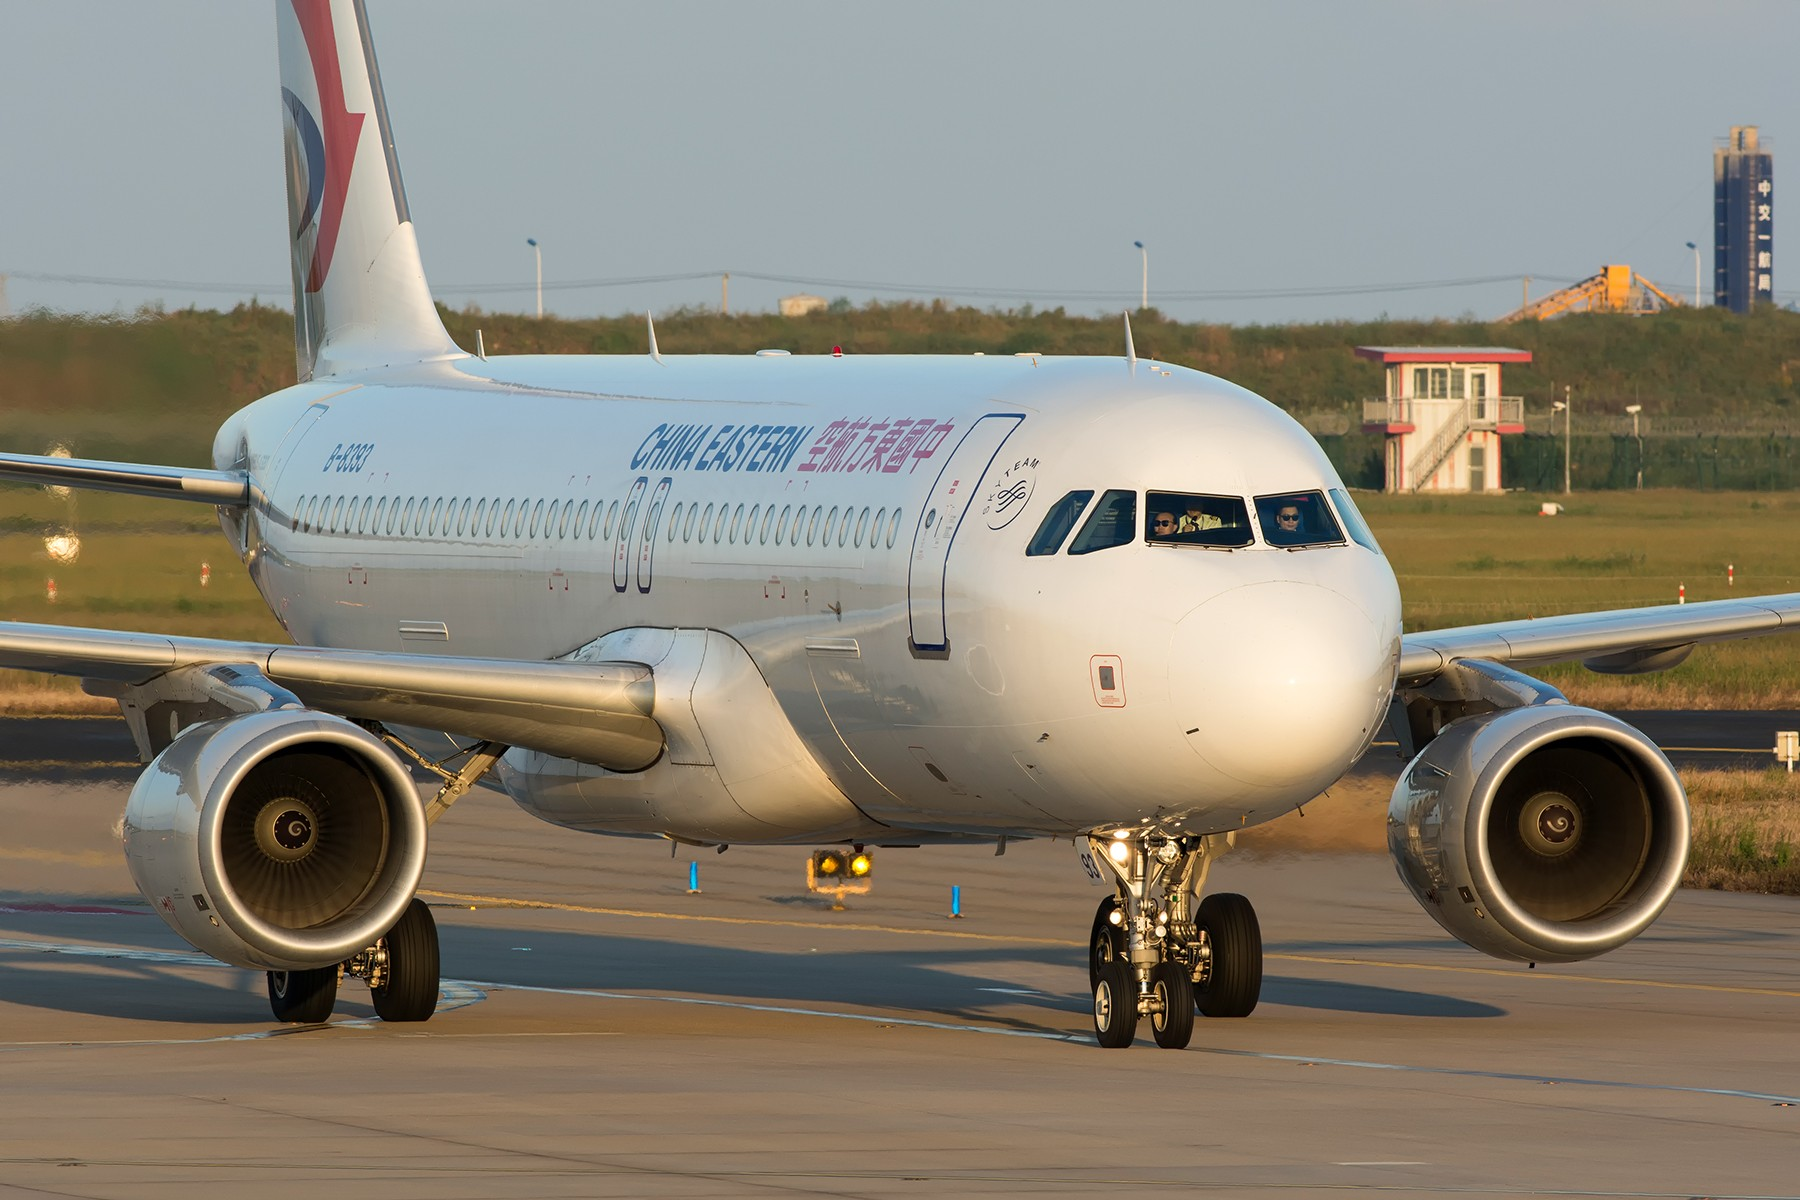 Re:[原创]【PVG】夕阳无限好,只是近黄昏 AIRBUS A320-200 B-8393 中国上海浦东国际机场